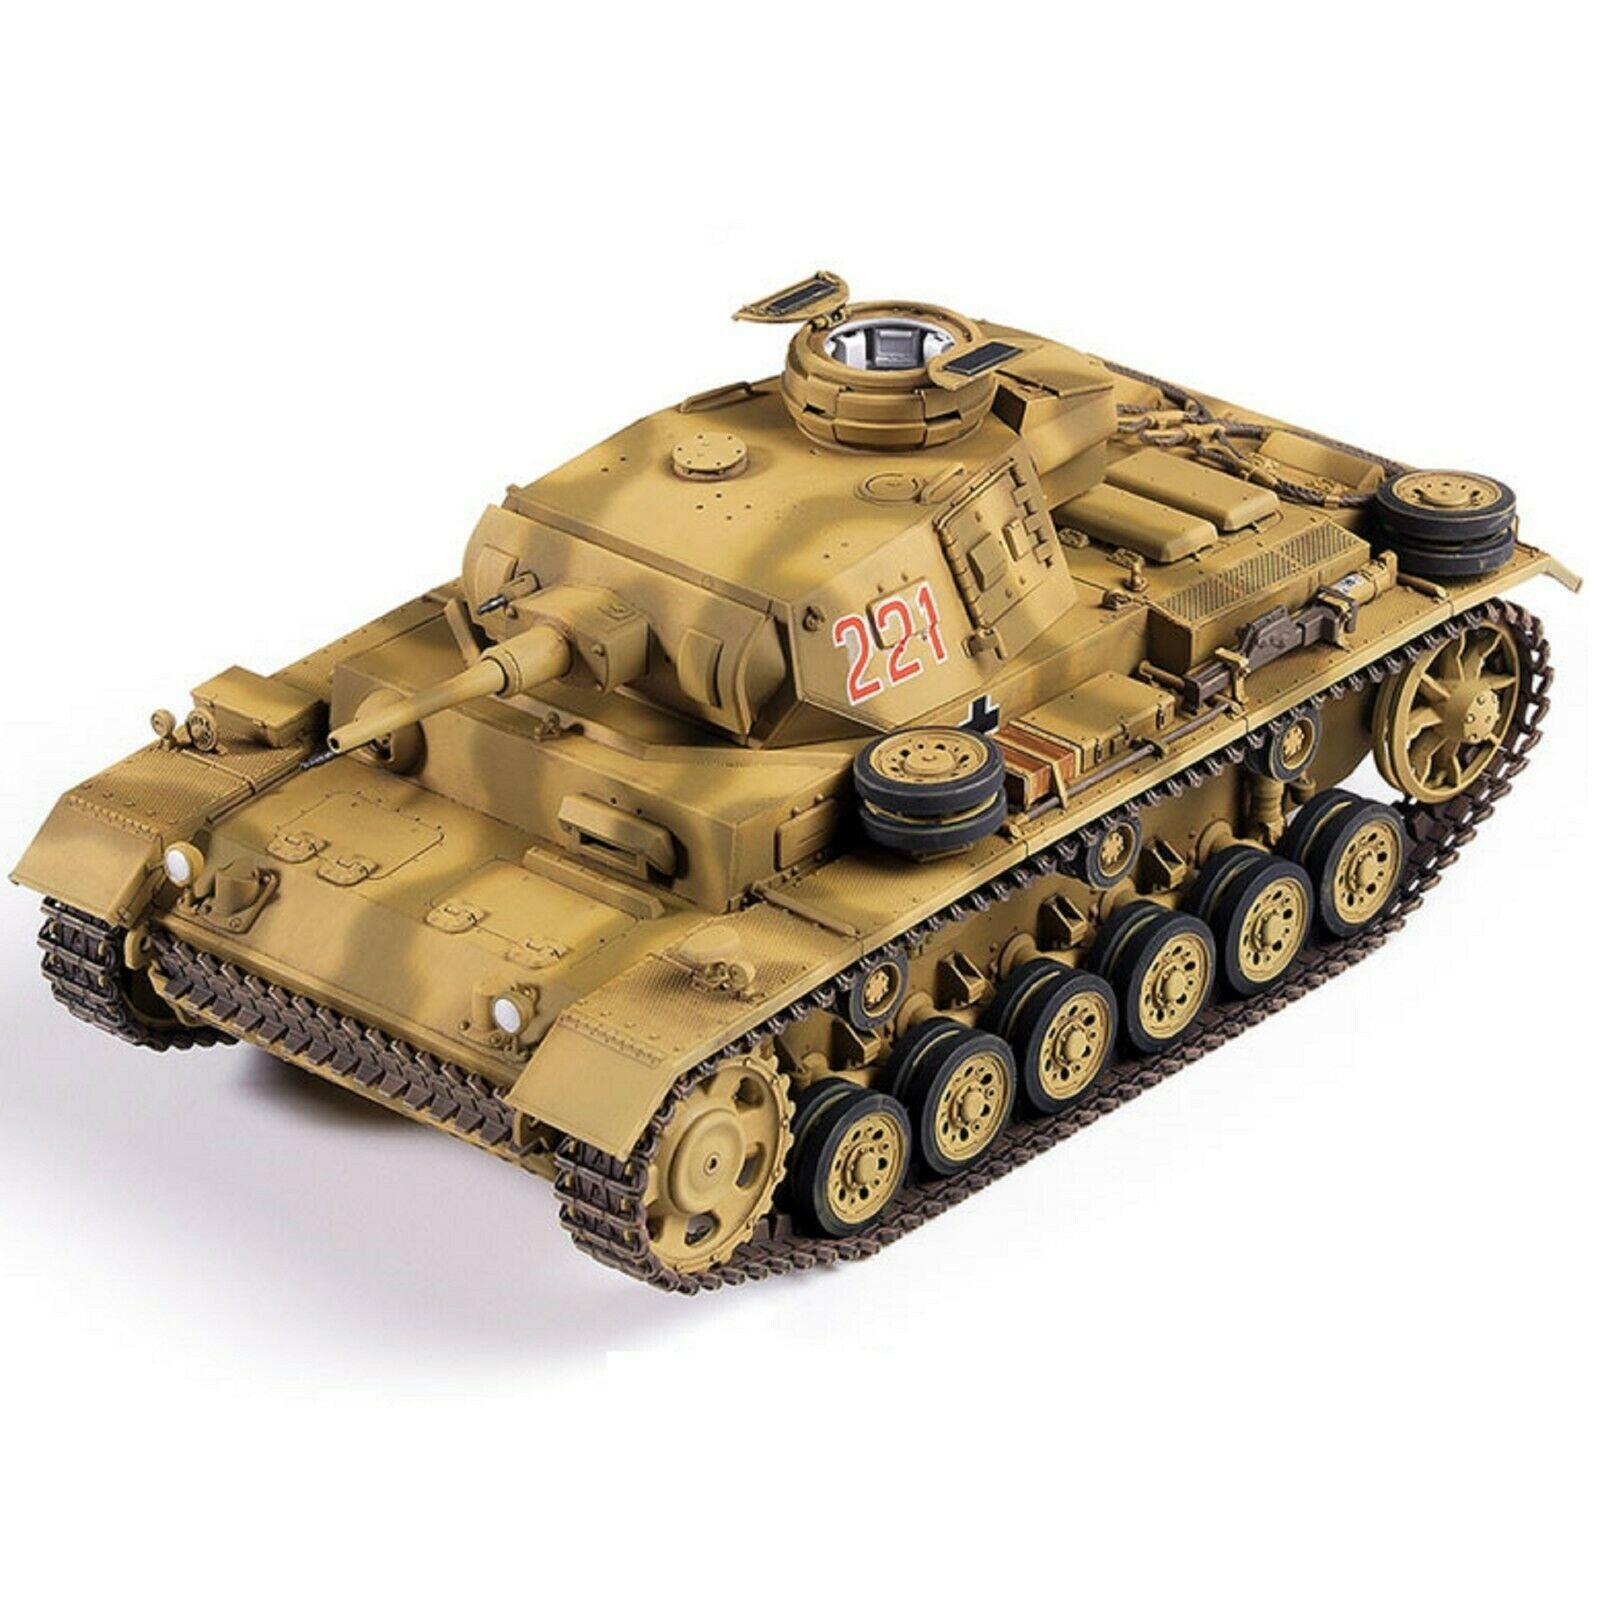 Academy 13531 German Panzer III Ausf.J North Africa Tank Plastic Hobby Model Kit